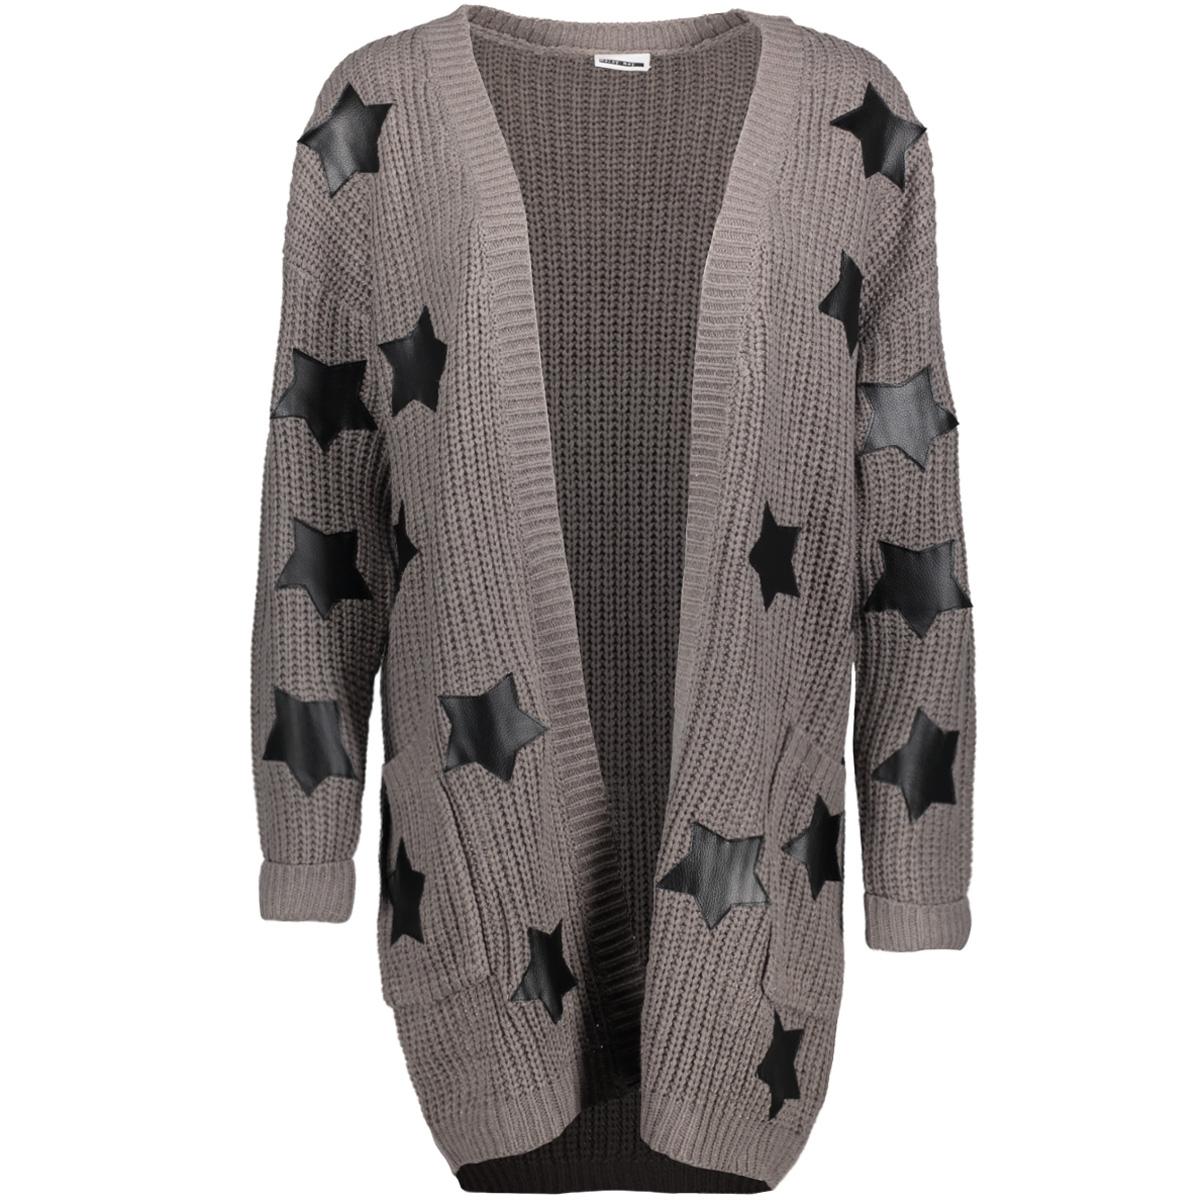 nmsane l/s knit cardigan 8 27000232 noisy may vest medium grey mel / black star